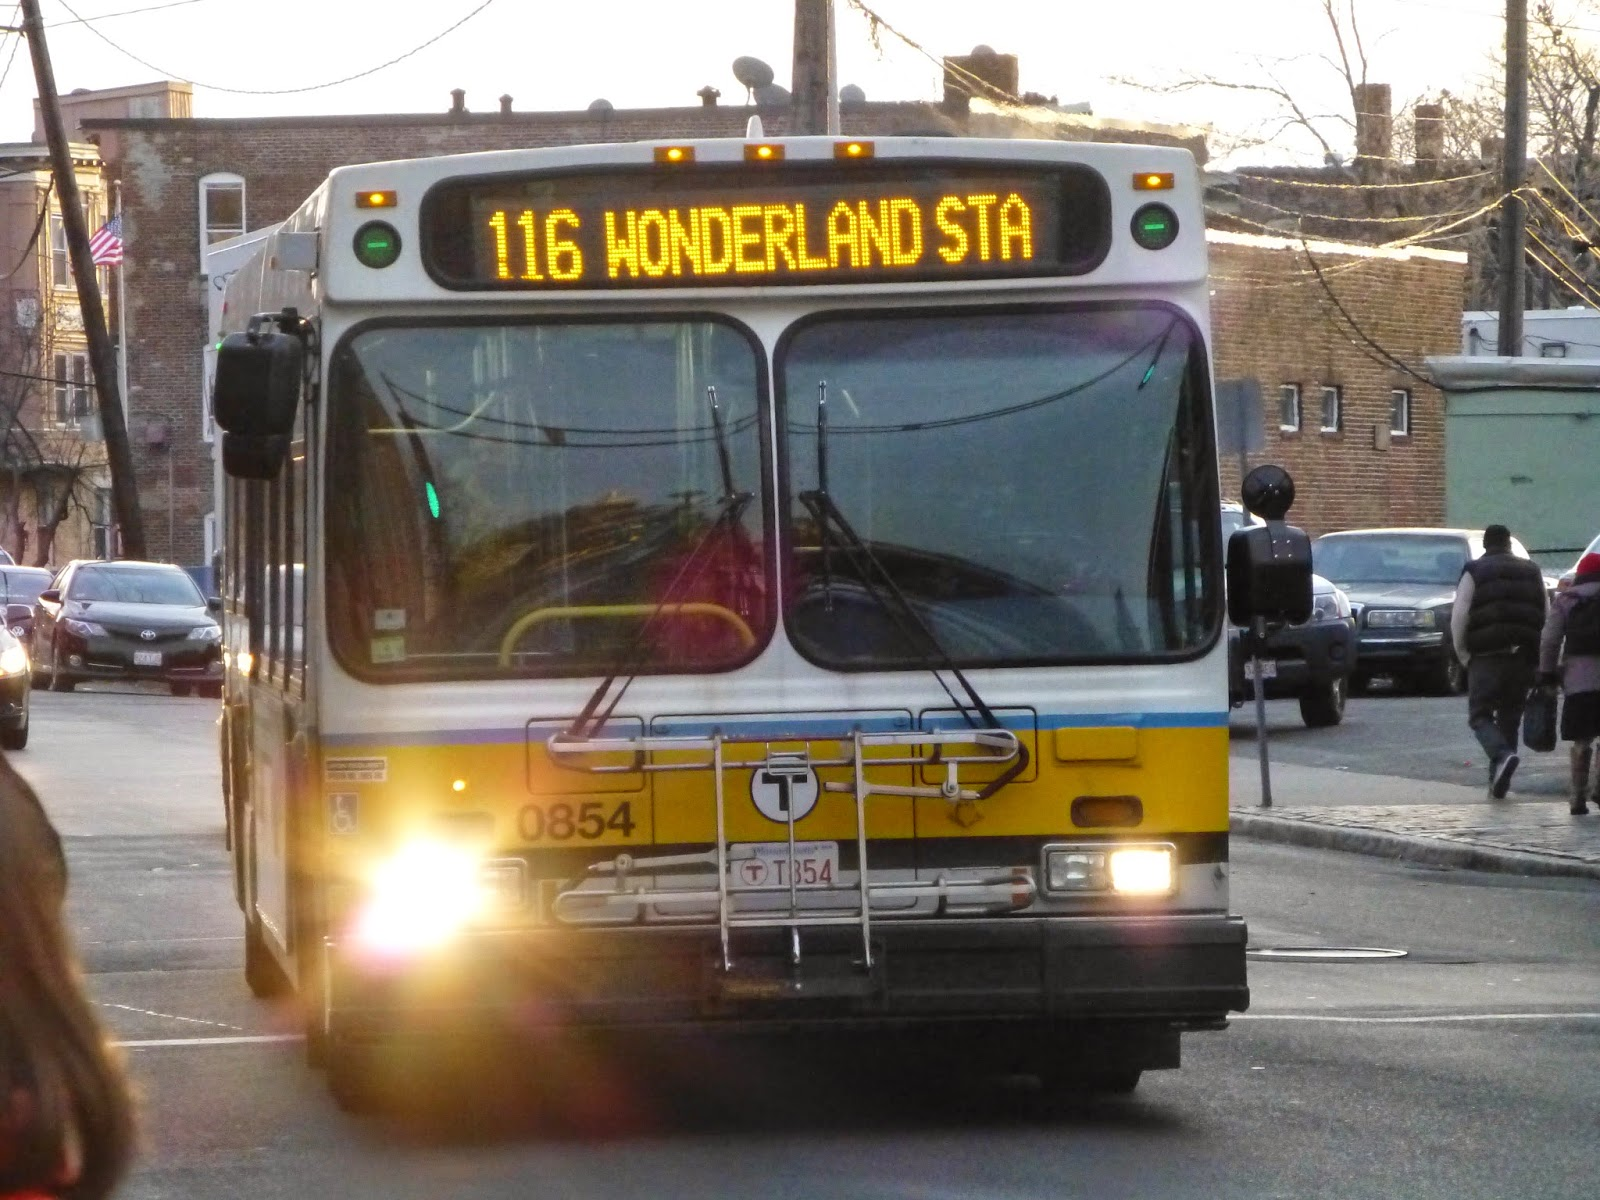 116/117 (Wonderland Station – Maverick Station via Revere Street or Beach Street)